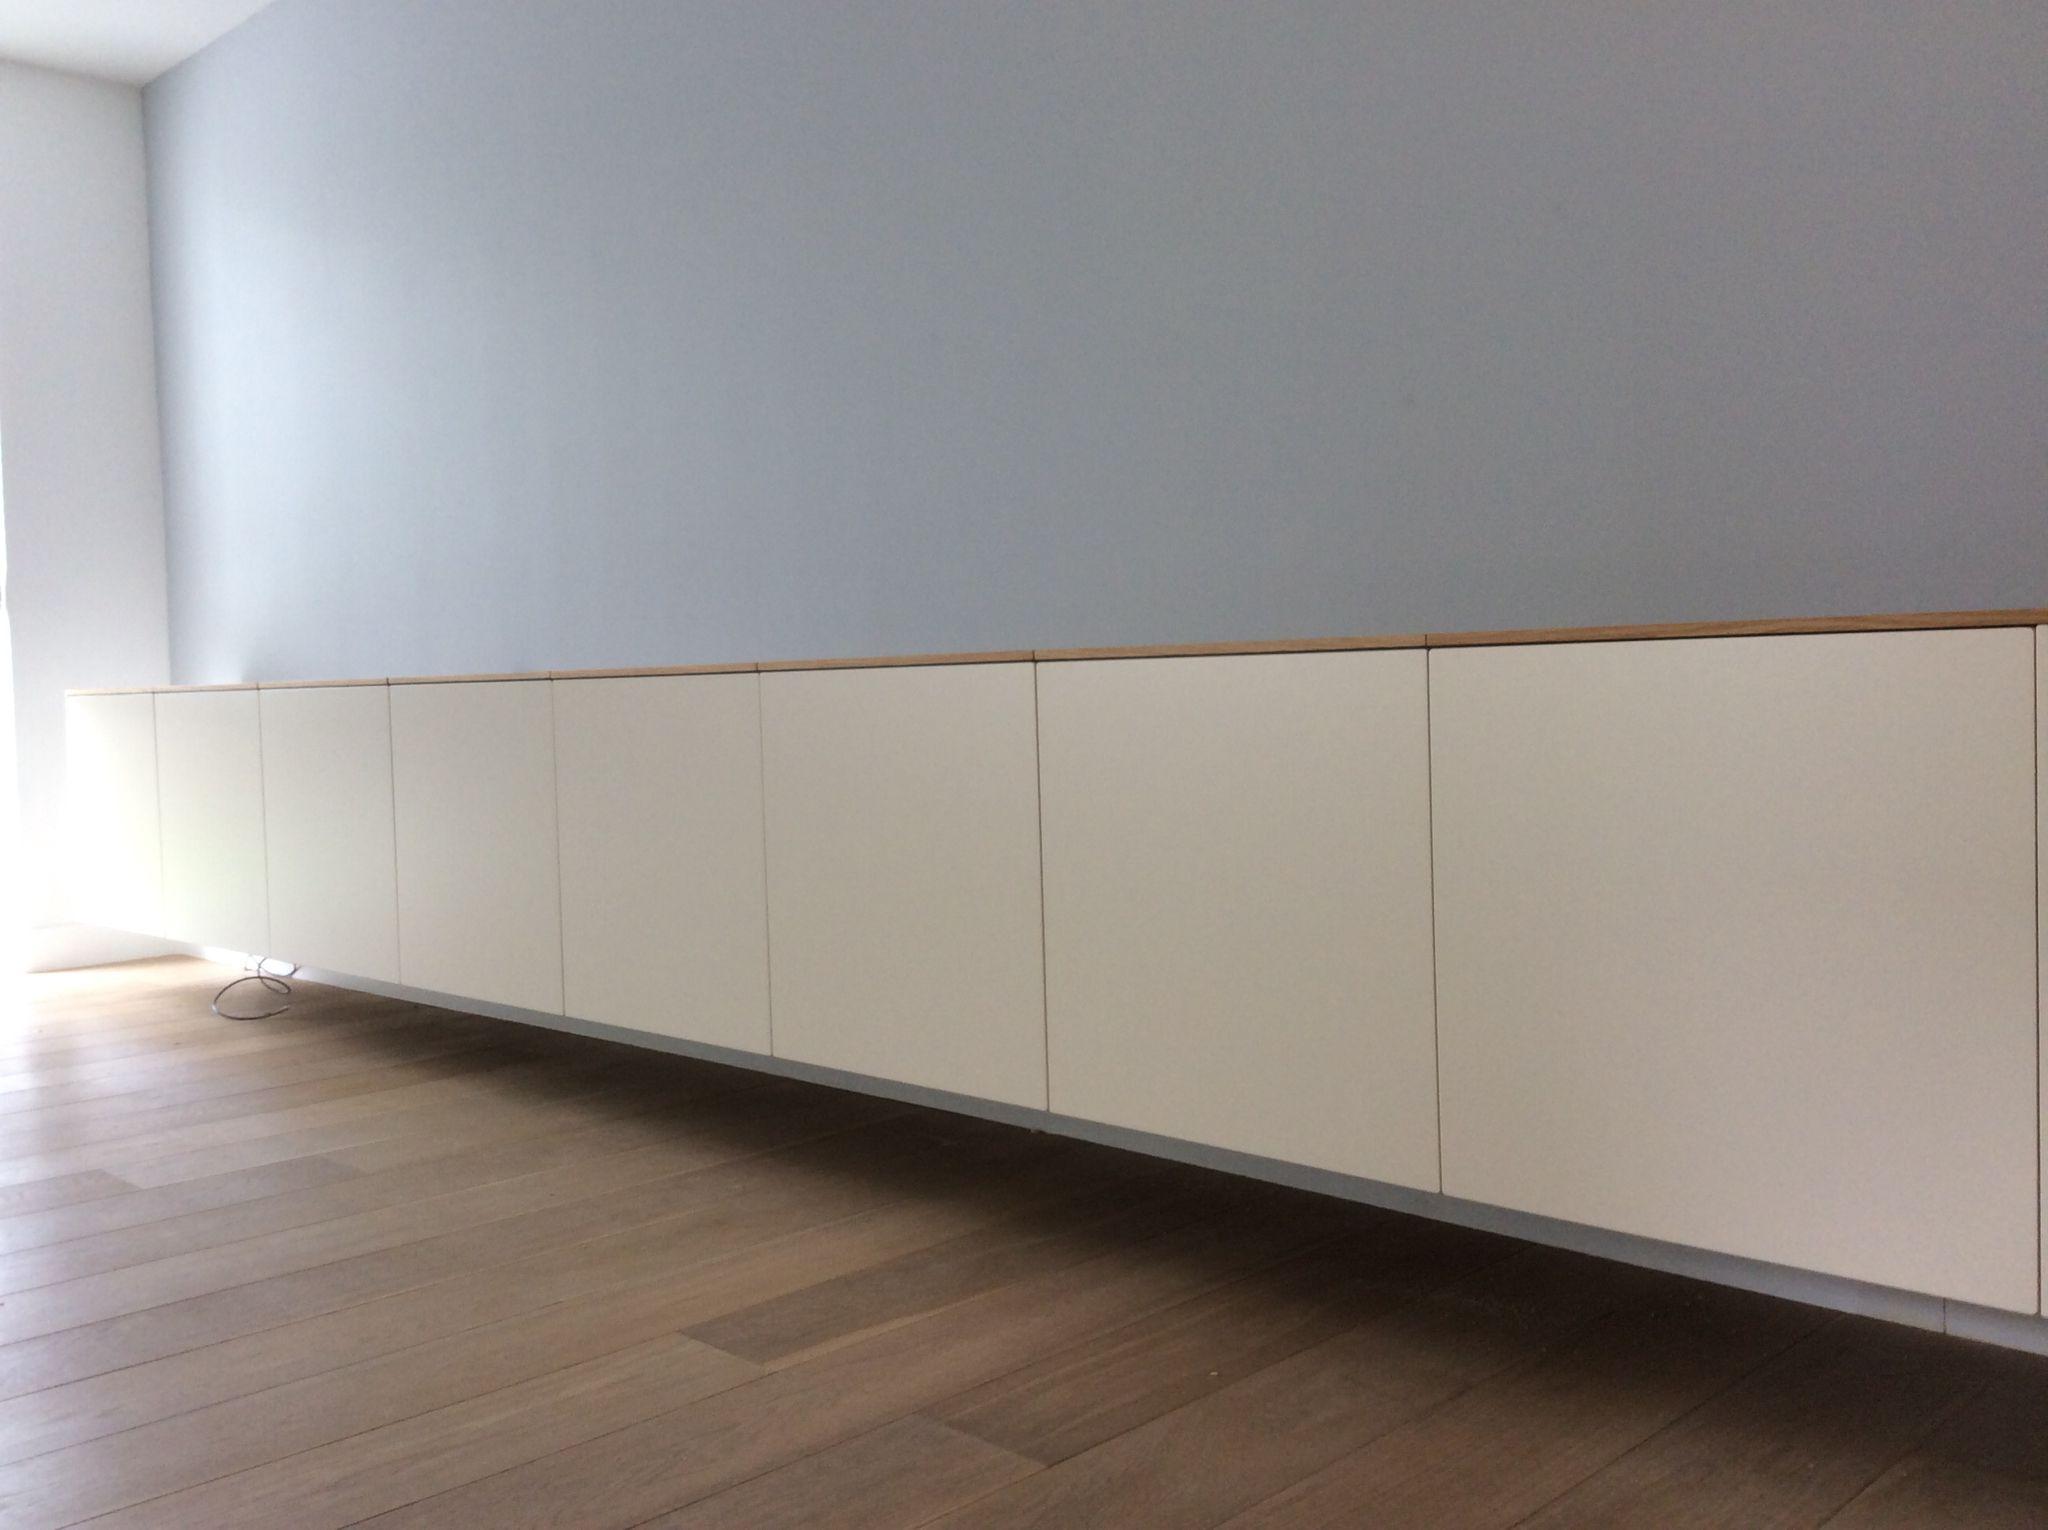 Zwevende Kast Ikea : Ikea wandplank slaapkamer slaapmaker make over deel